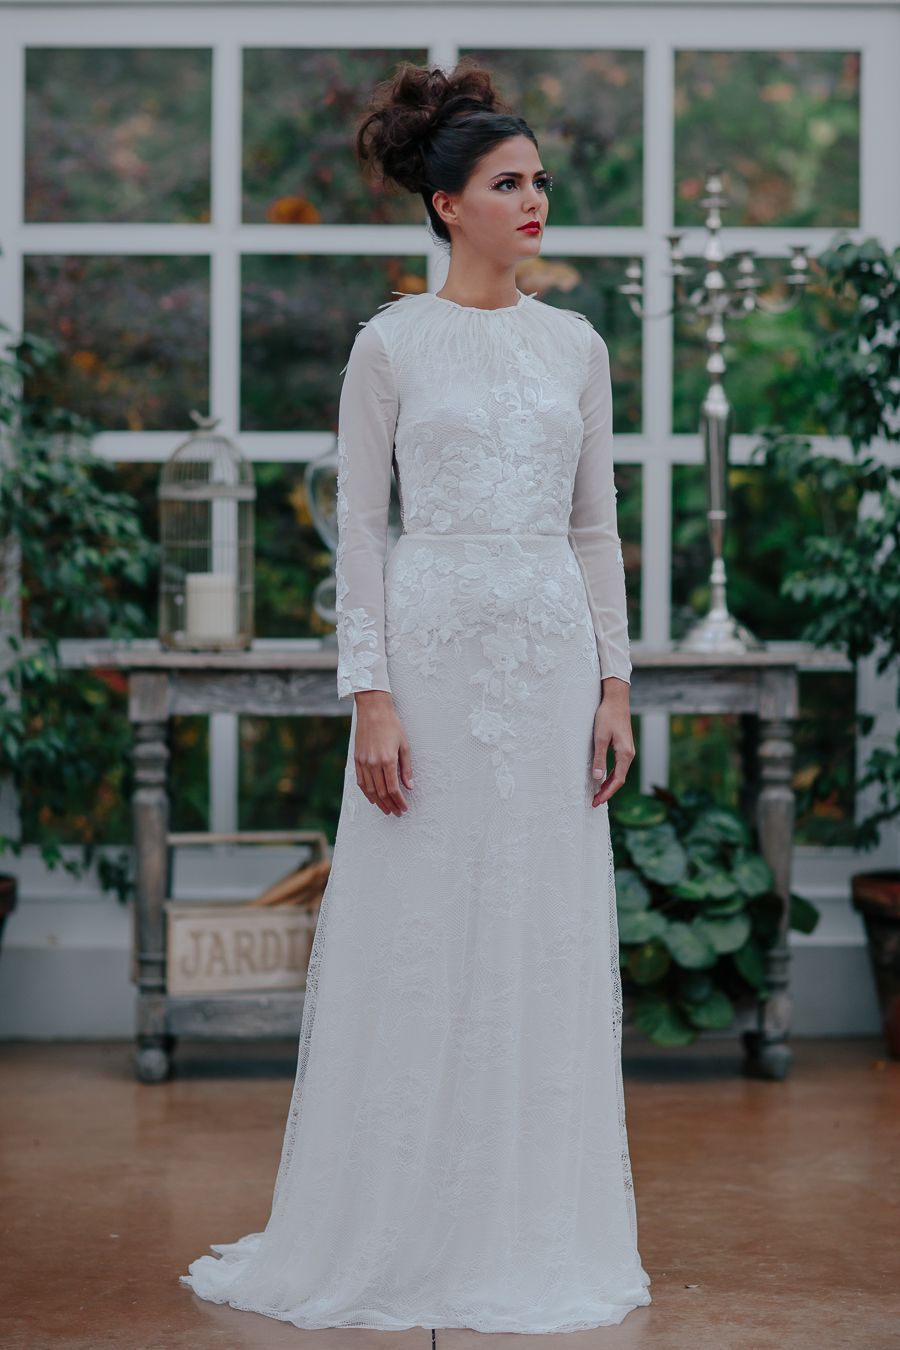 Padrin An 1 6 | Ao dai | Pinterest | Vestidos de novia, Novios y De ...